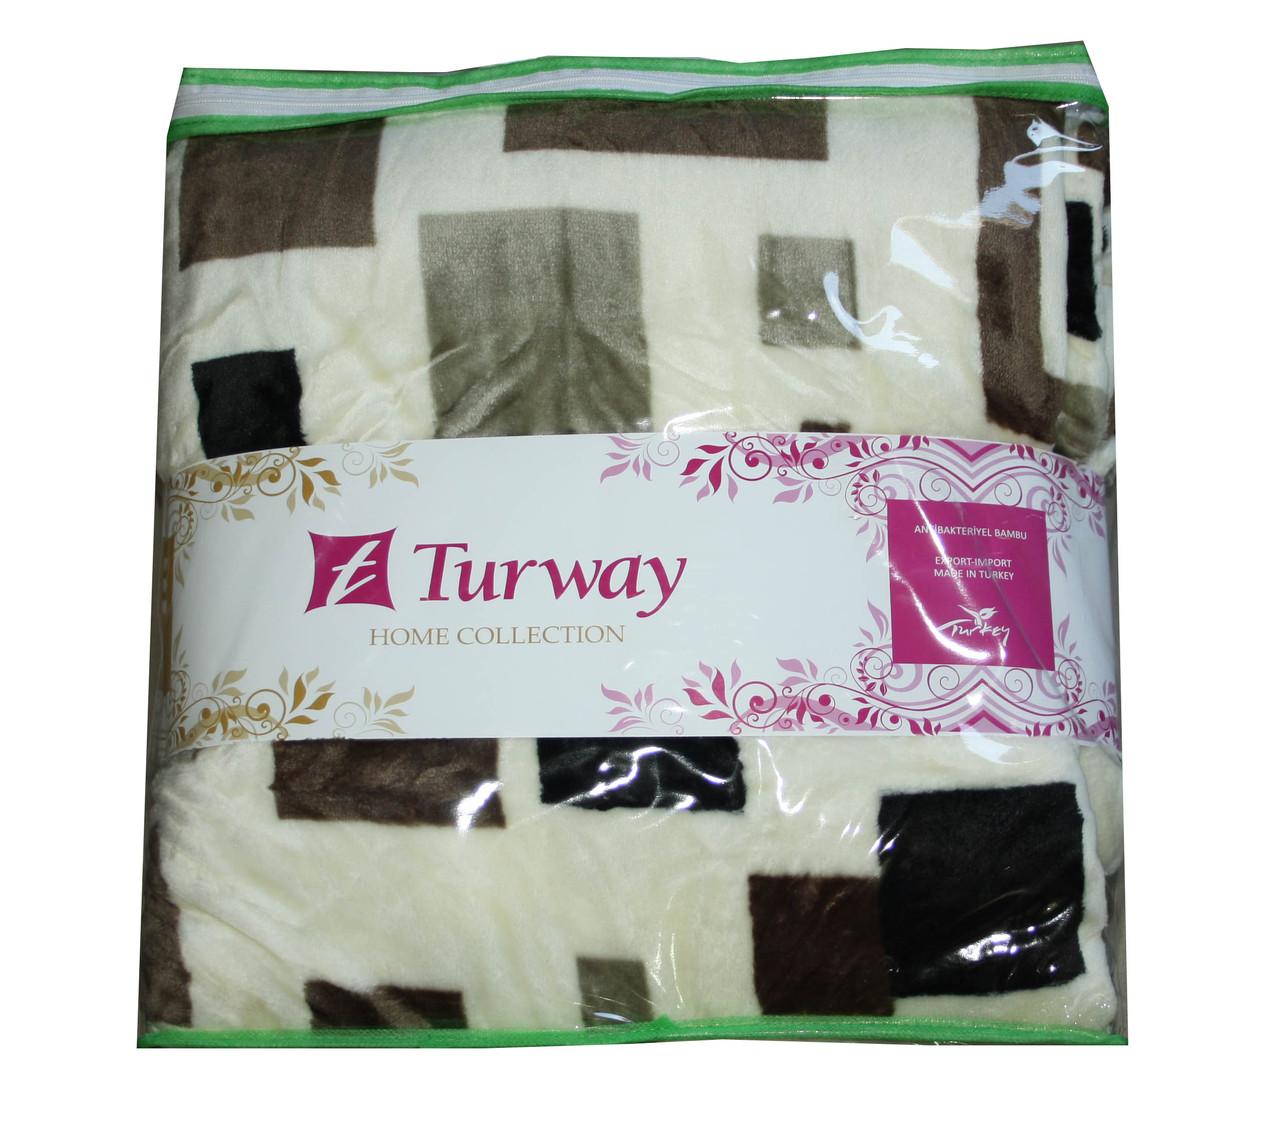 Махровая простыня Turway Home Collection 160*220